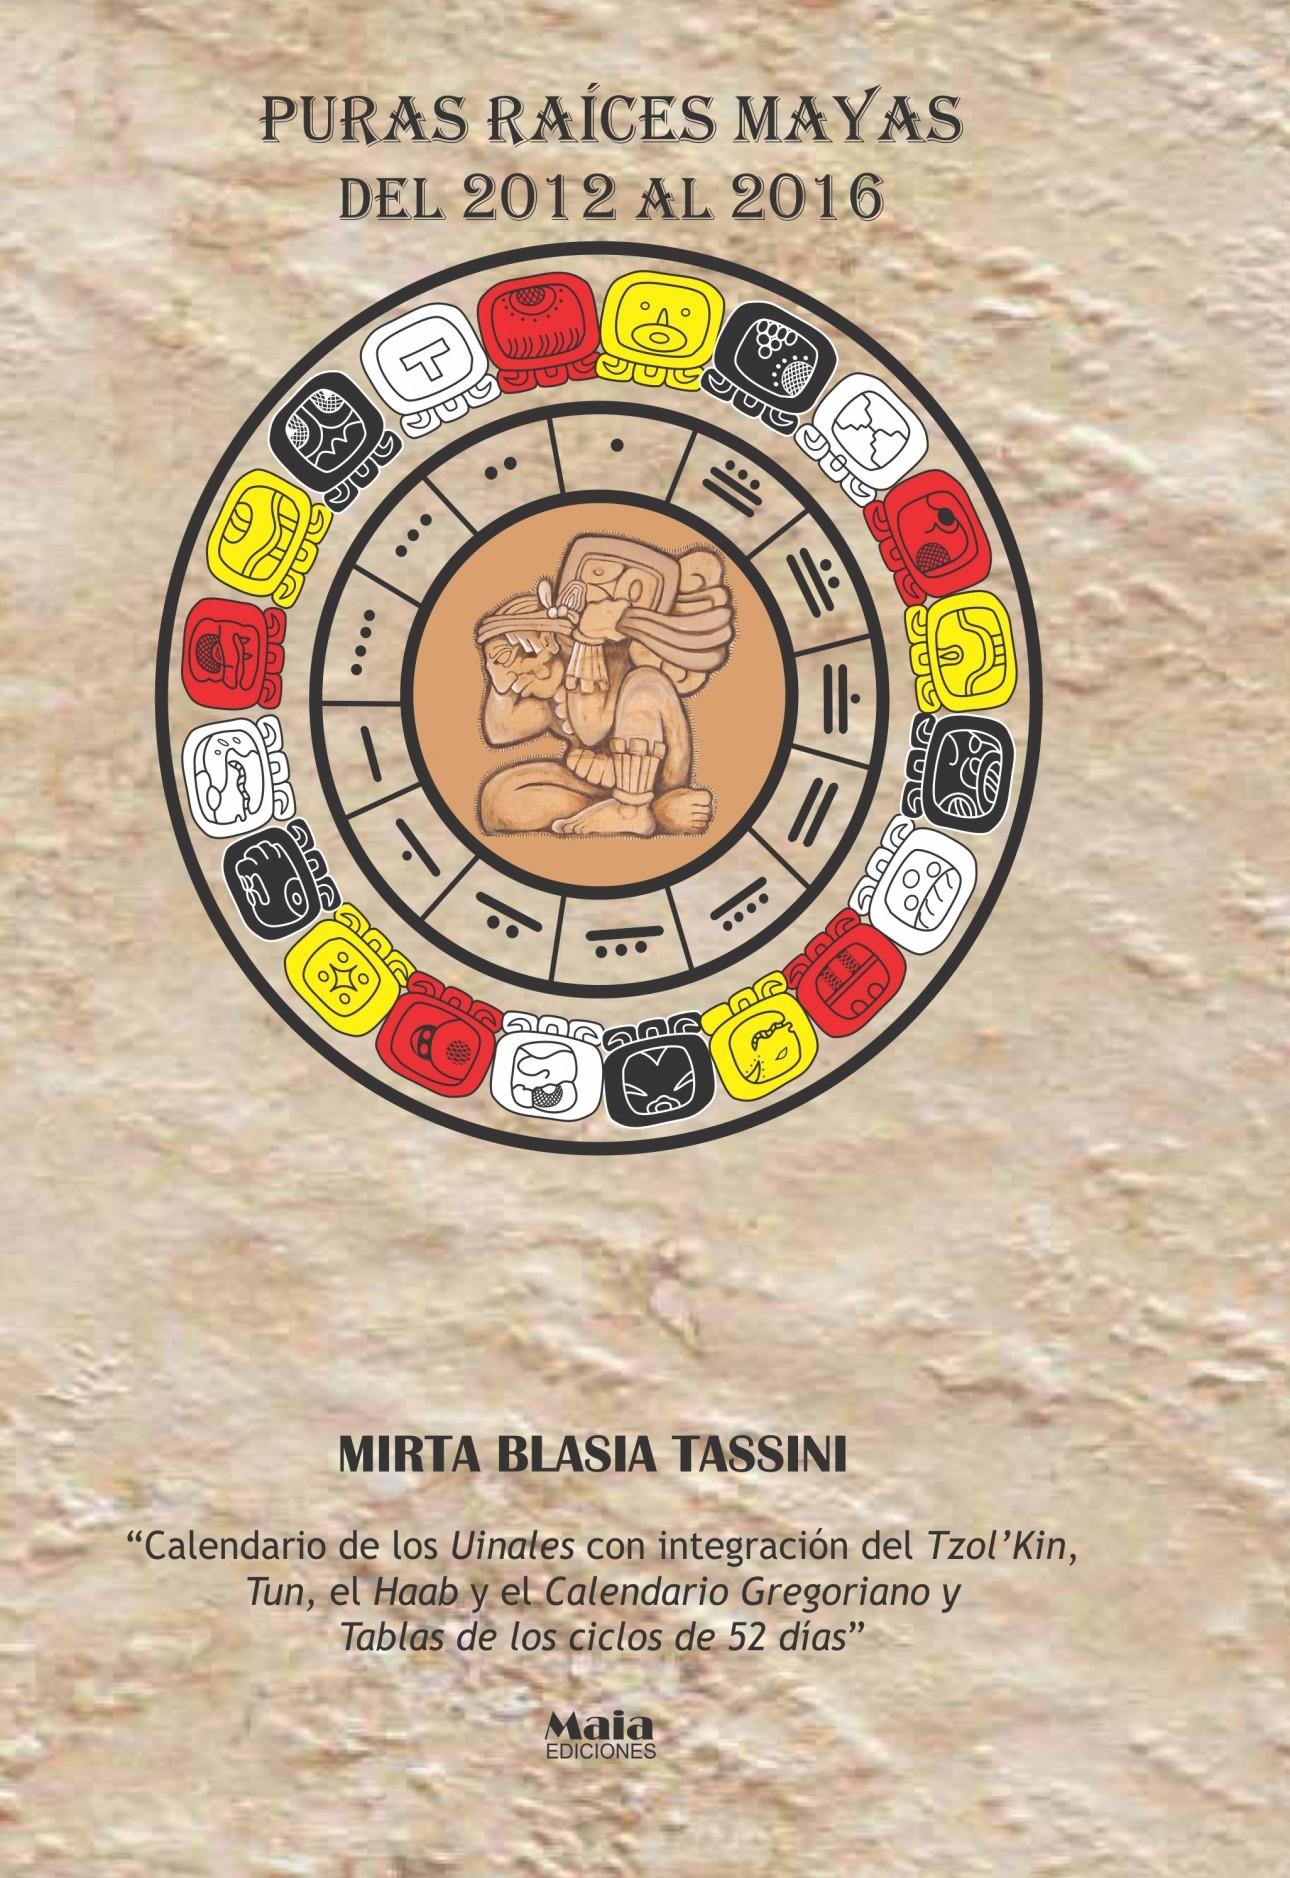 Calendario Solar Maya.Calendario Solar Maya 2012 2016 Puras Raices Mayas